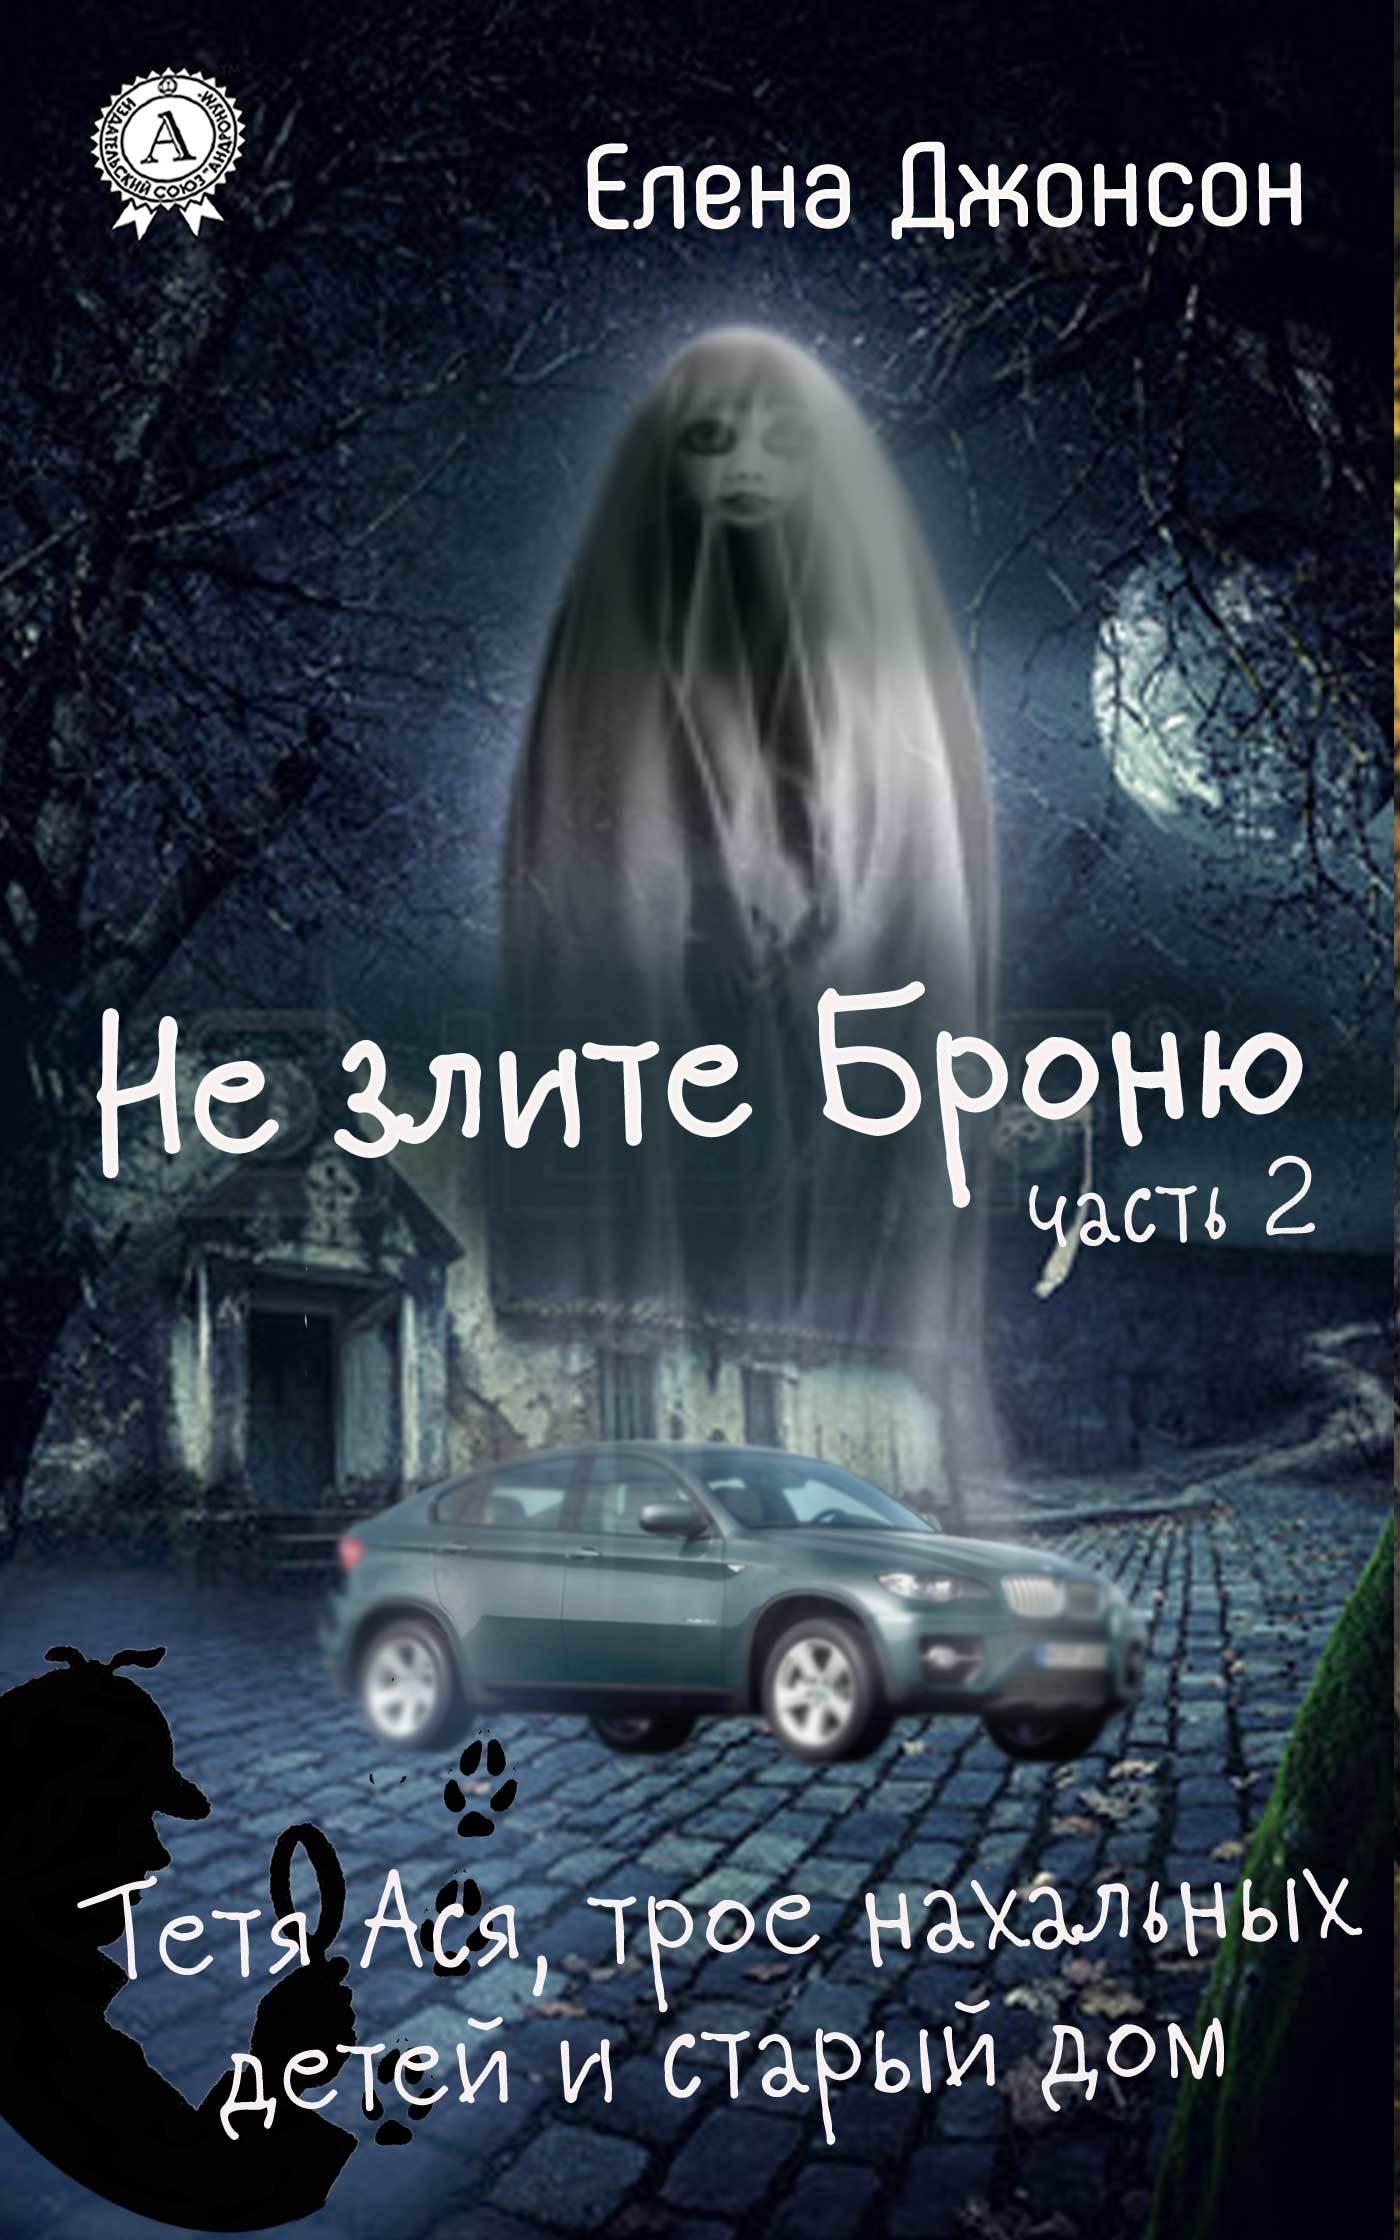 Елена Джонсон - Не злите Броню